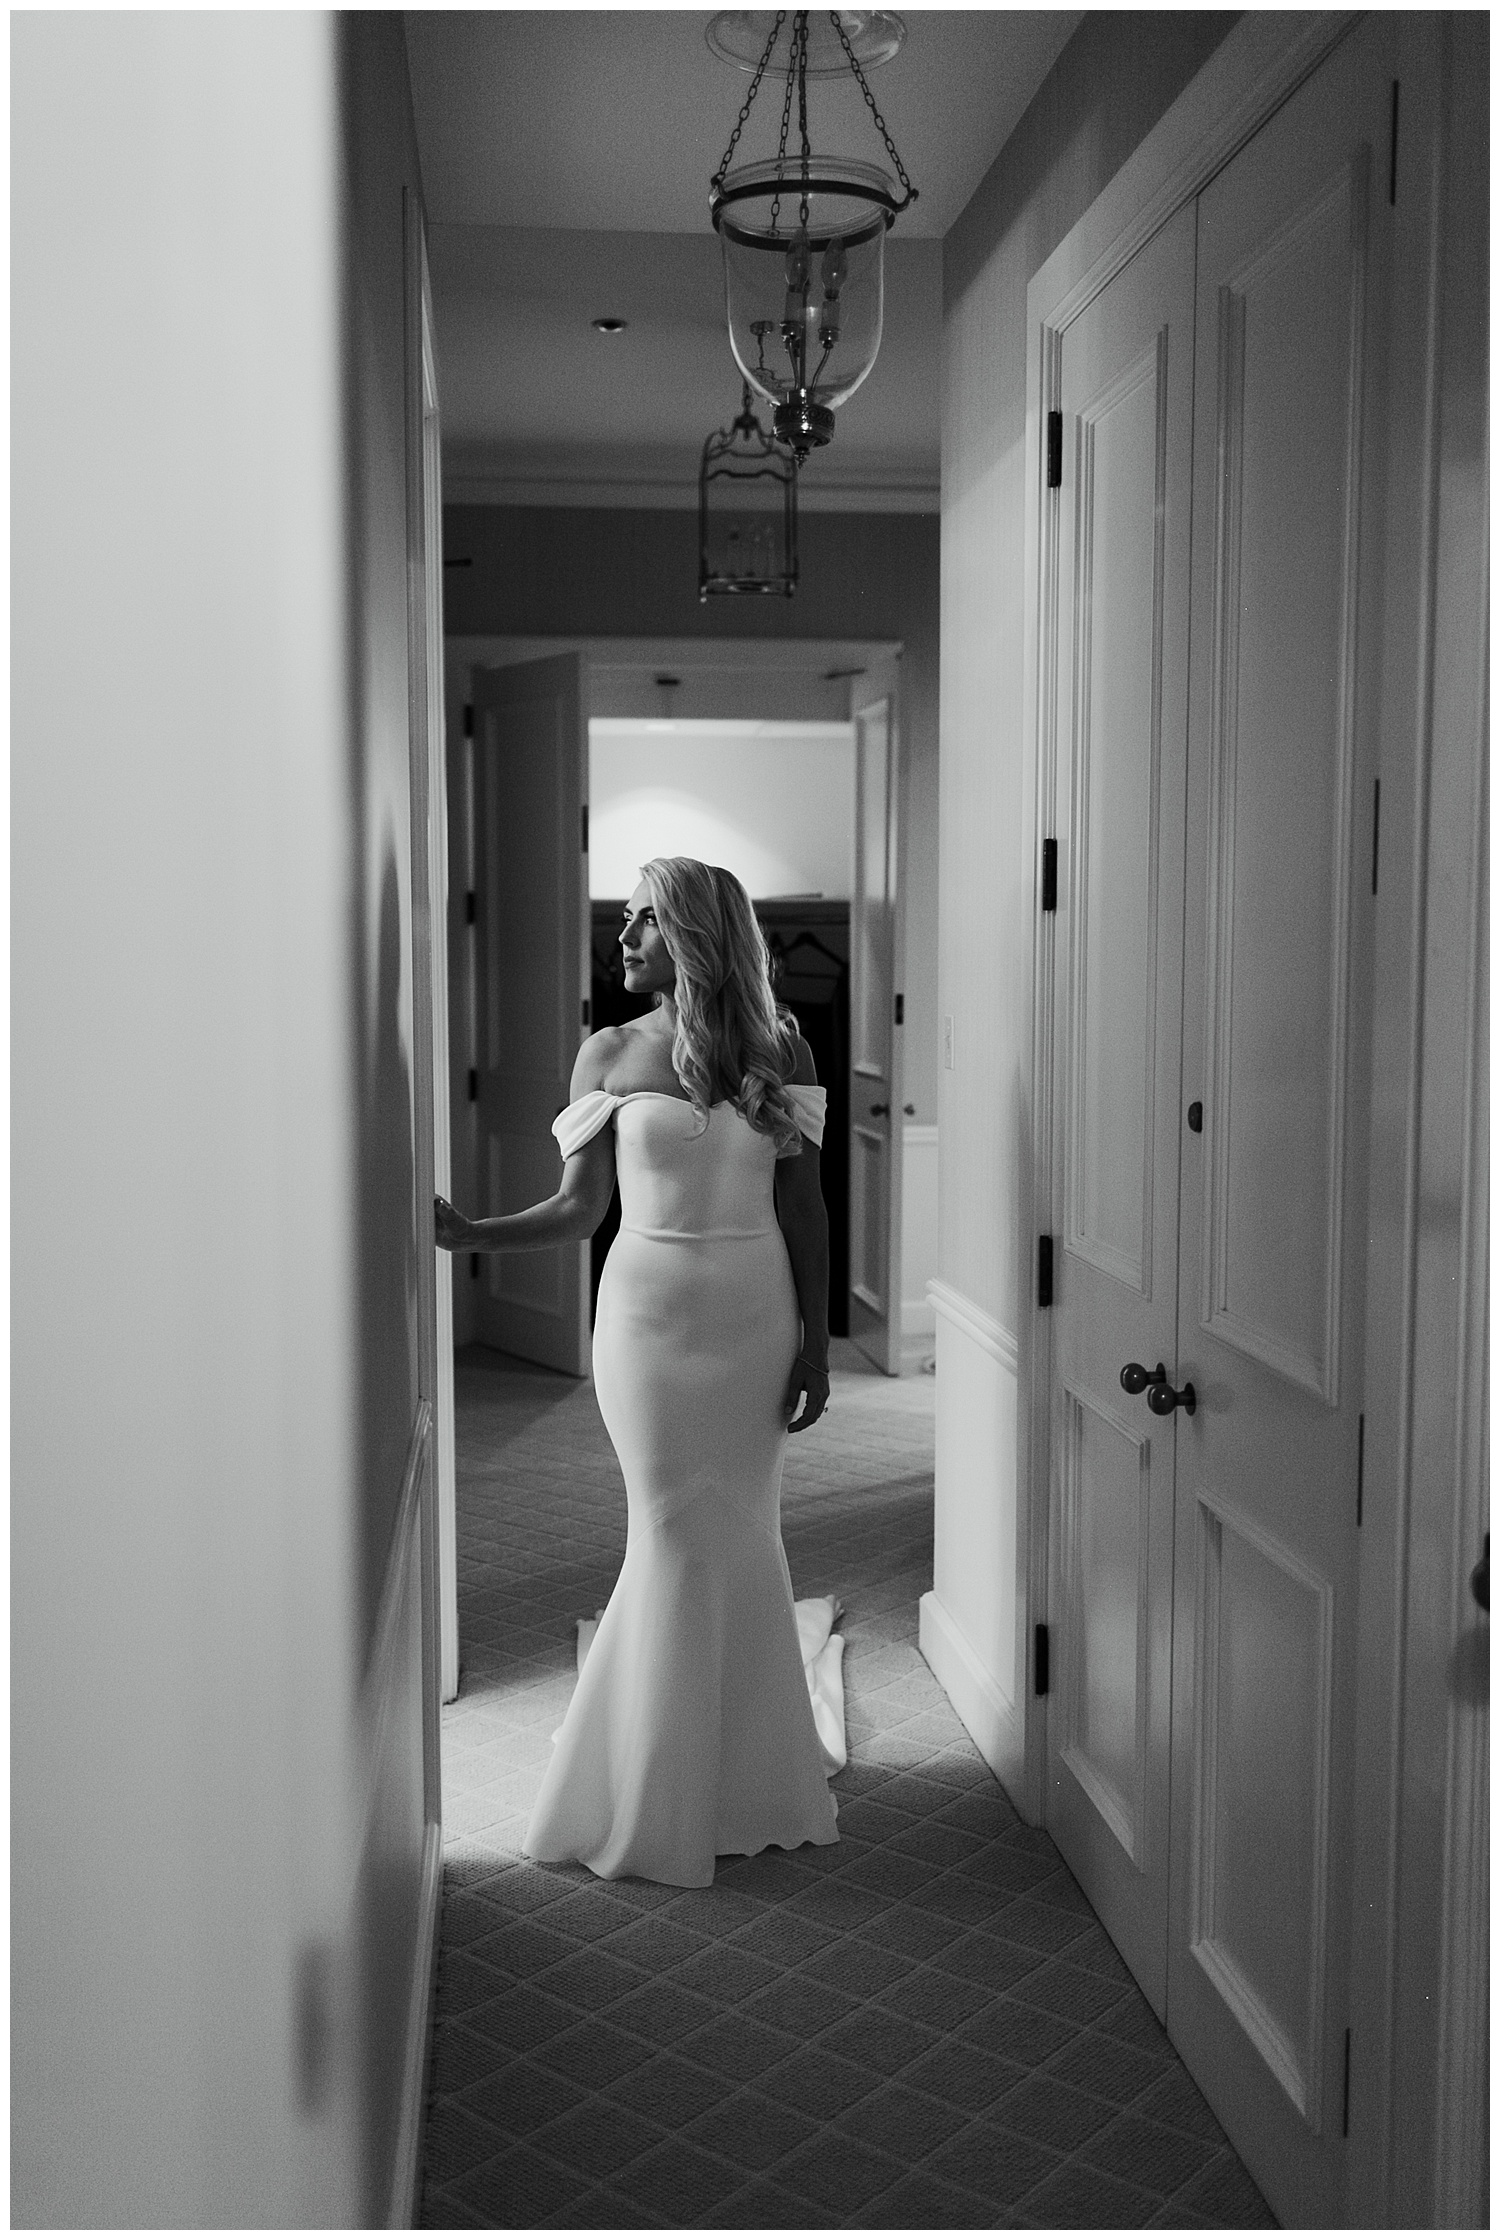 Fairmont Olympic Hotel Wedding_Elizabeth Zuluaga_Taylor & Caton_025.jpg